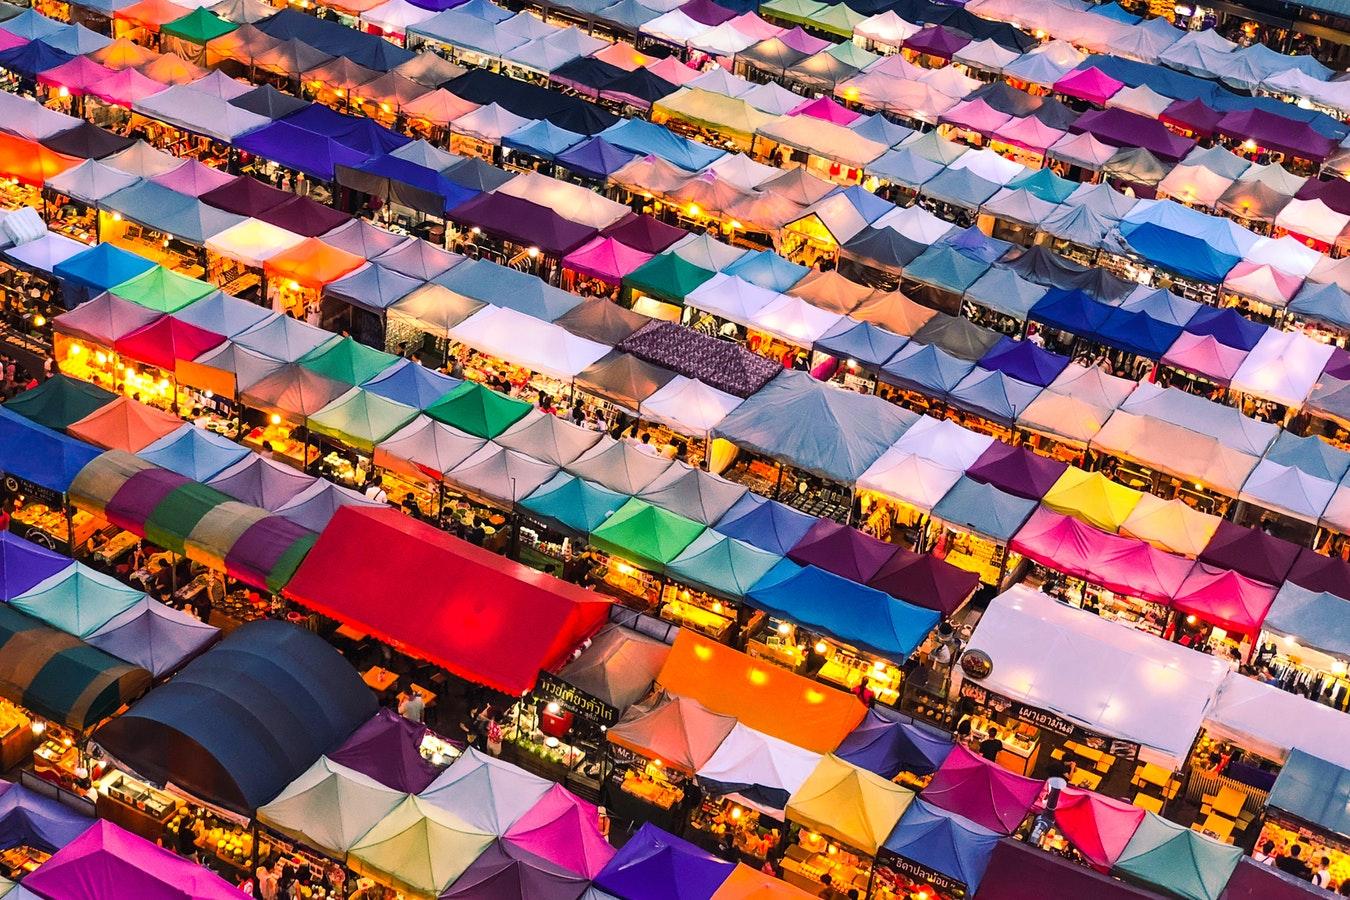 Chatuchak bangkok market - Things to do in Bangkok